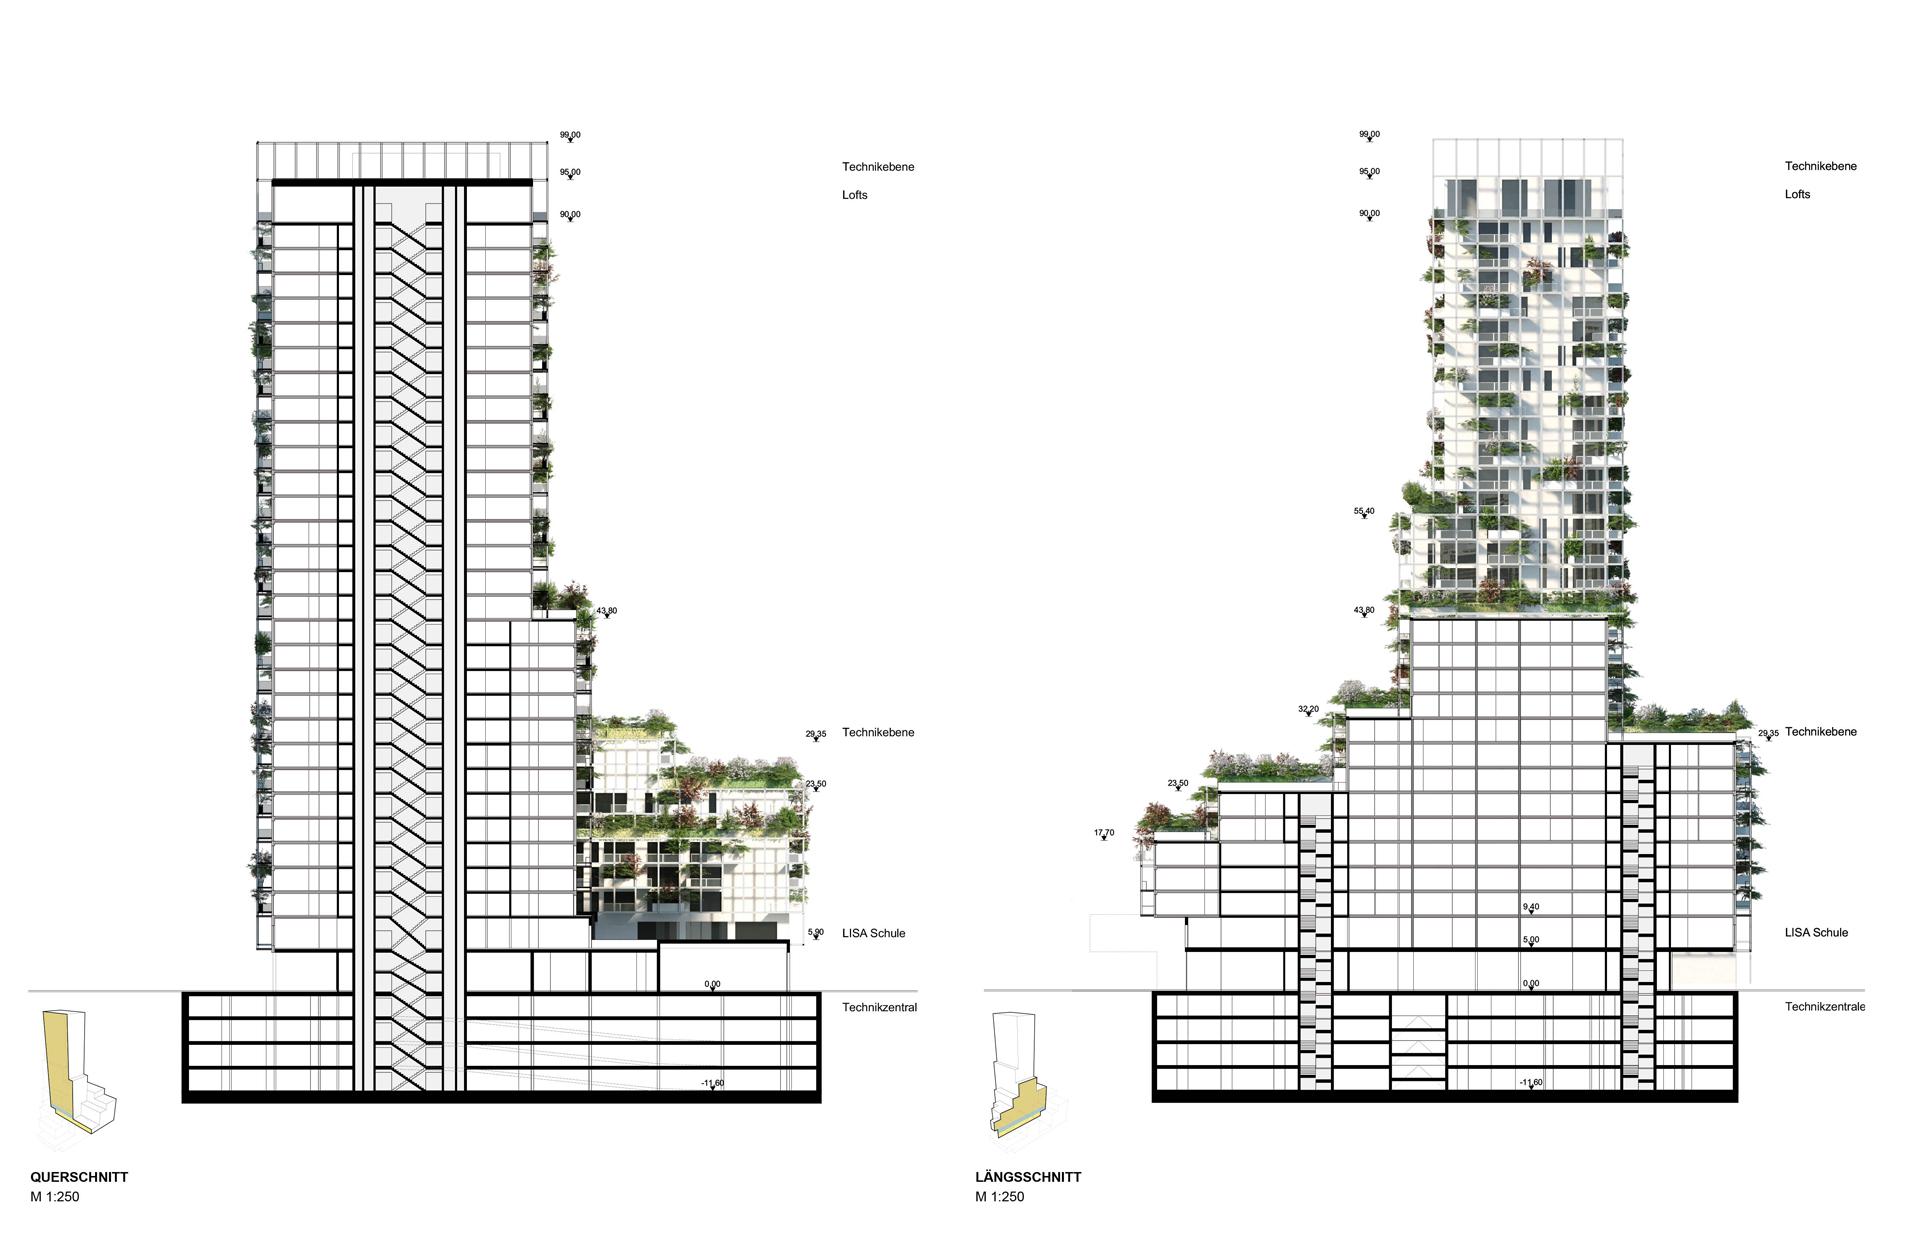 1646_WB-Bruckner-Towers-Linz_Schnitte